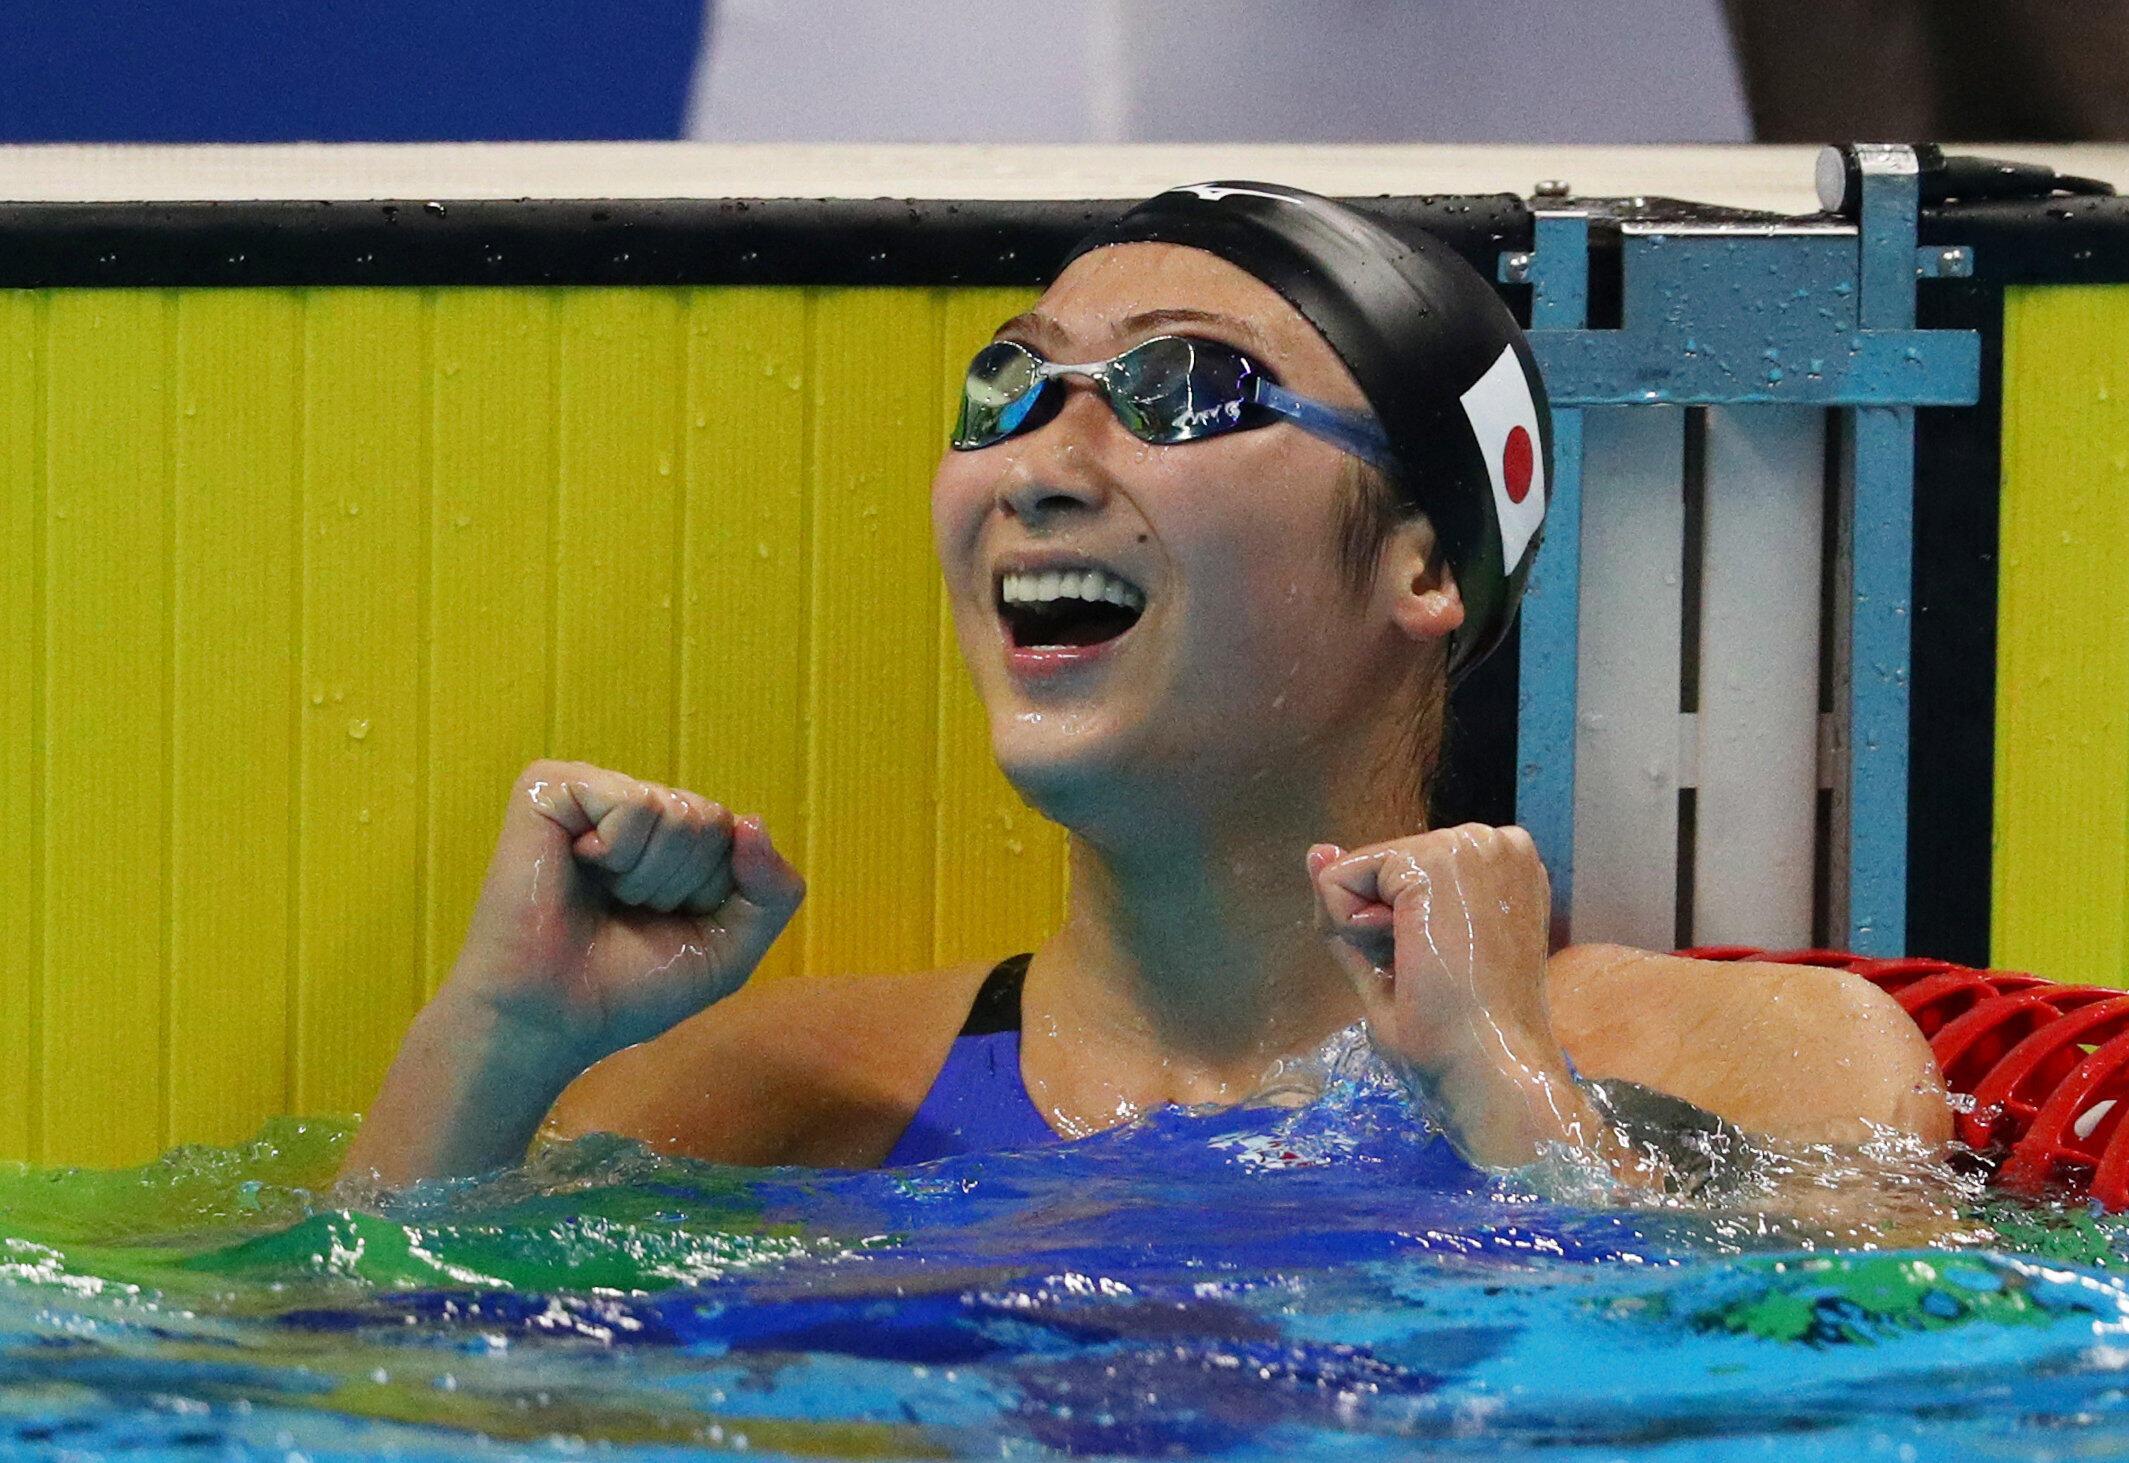 Rikako Ikee celebrates winning the Women's 50m Freestyle event.